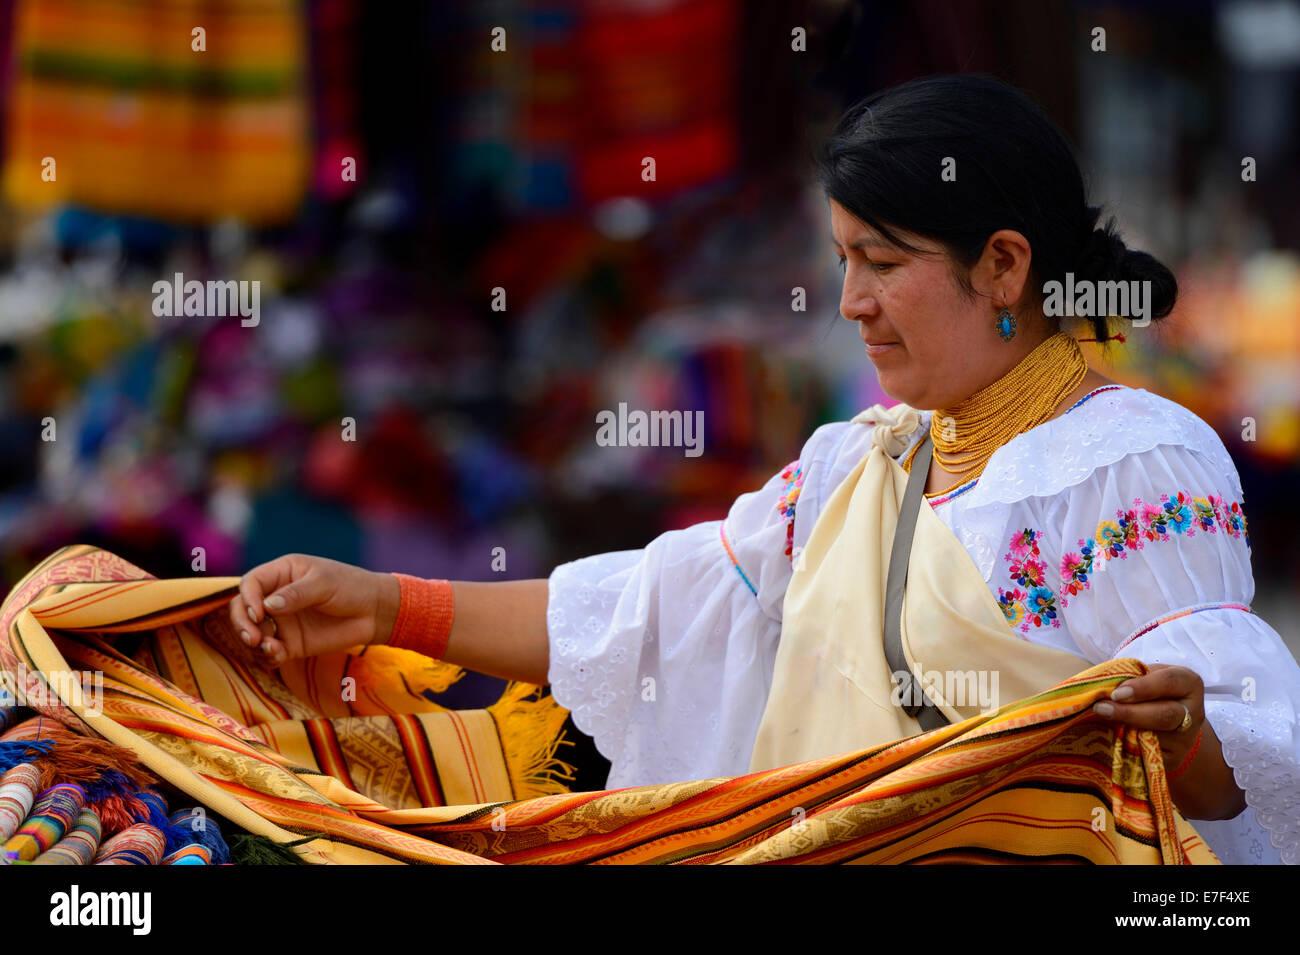 Market woman selling fabrics, Quito, Ecuador, South America - Stock Image